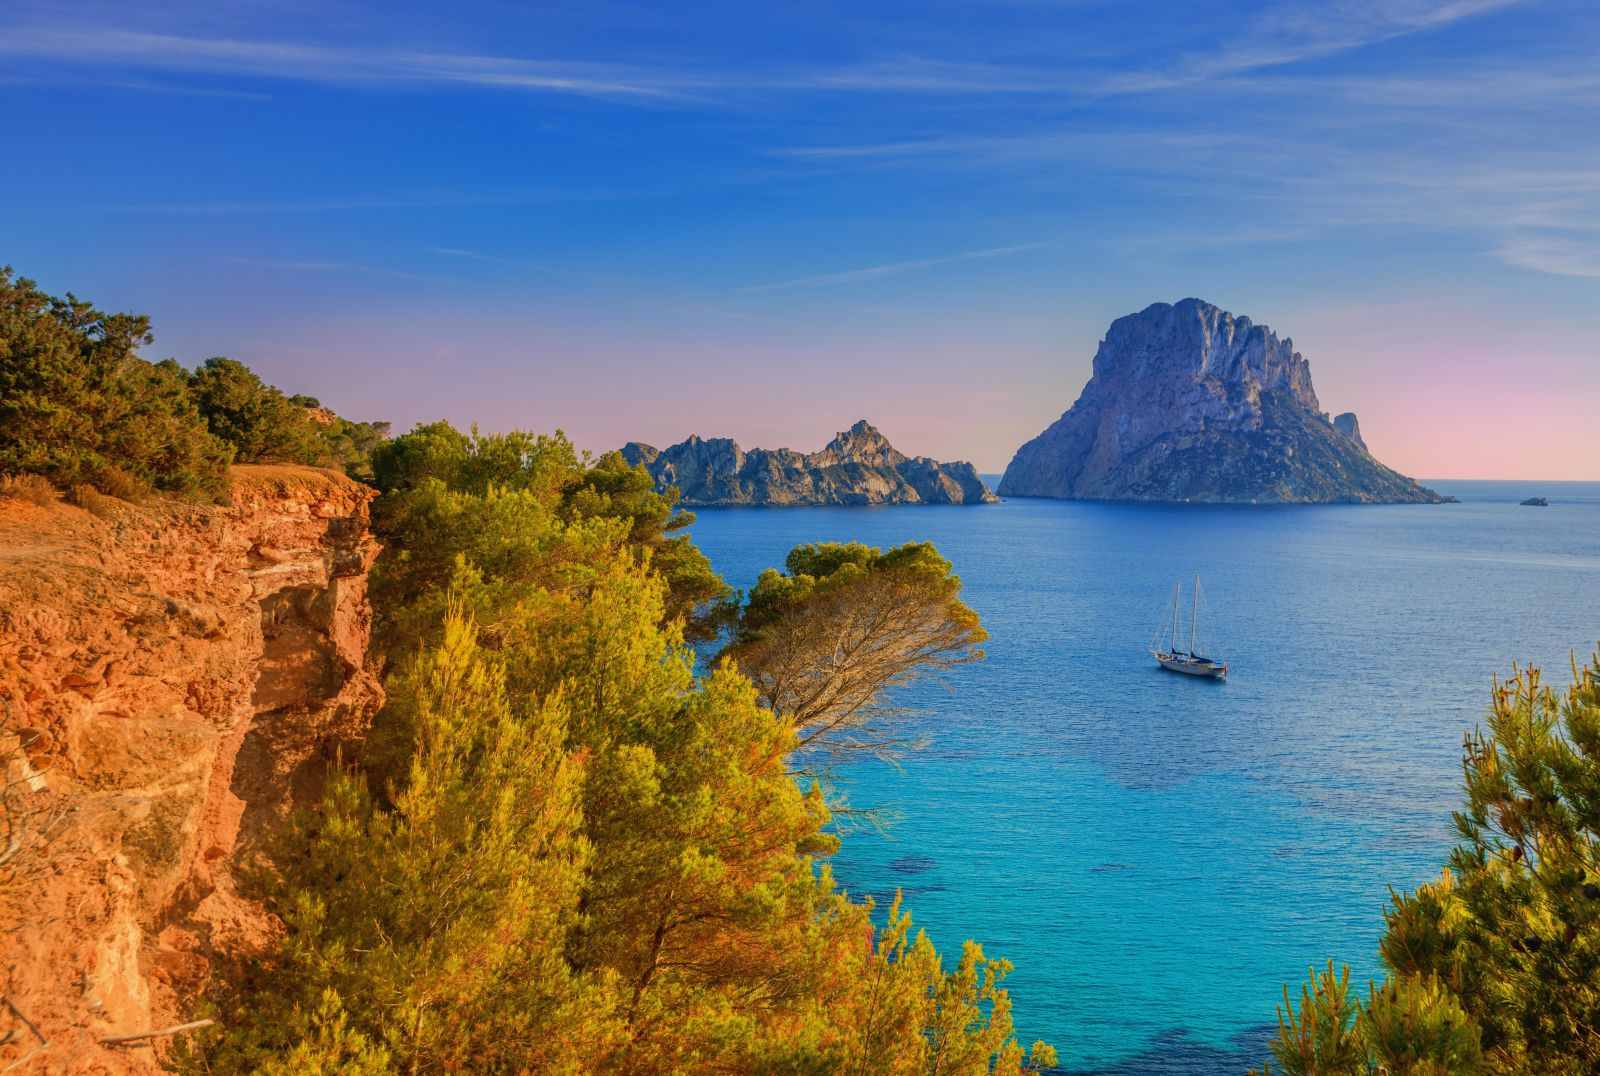 Balearic Islands, Boat, Coast